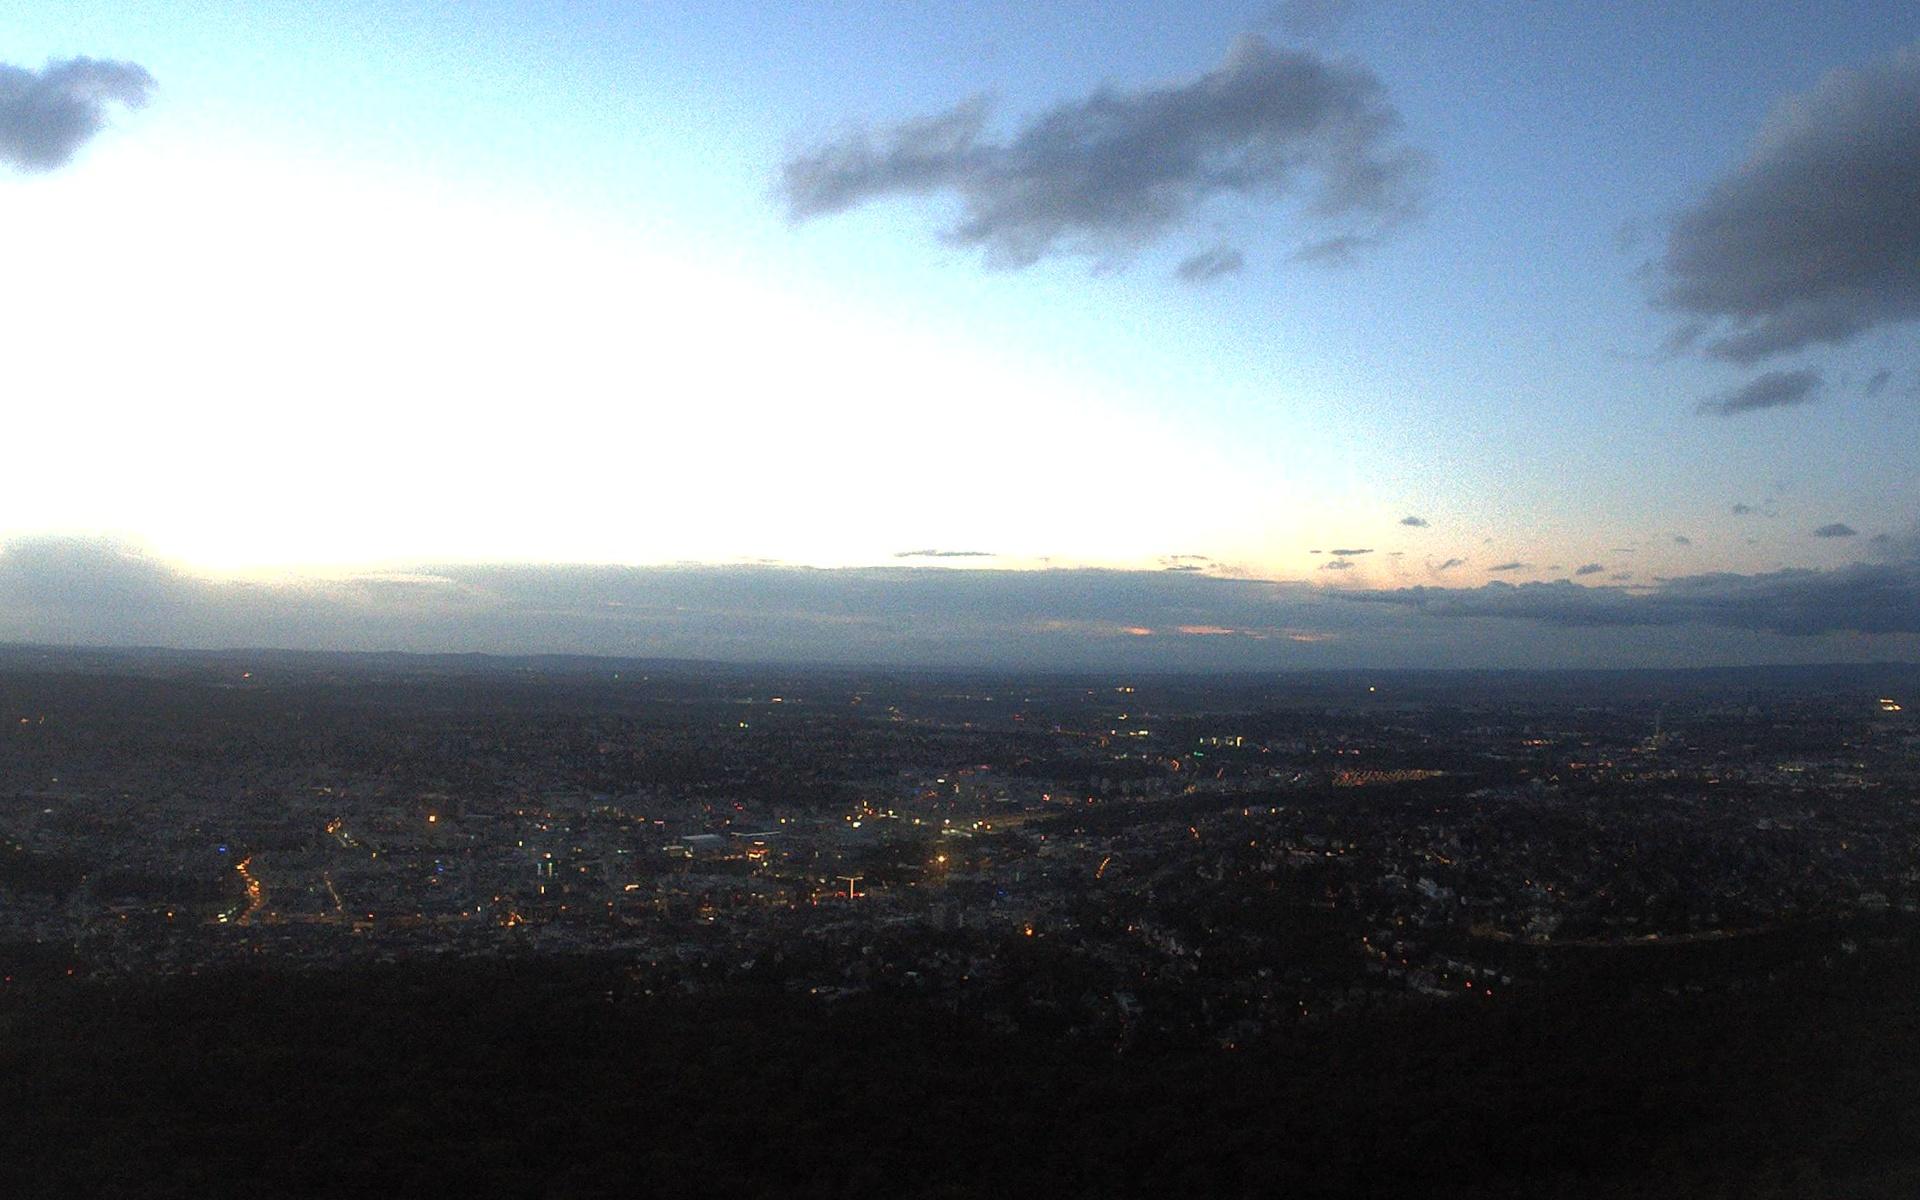 Stuttgarter Fernsehturm 217m (Aussichtsplatform 150m) Blick nach Norden